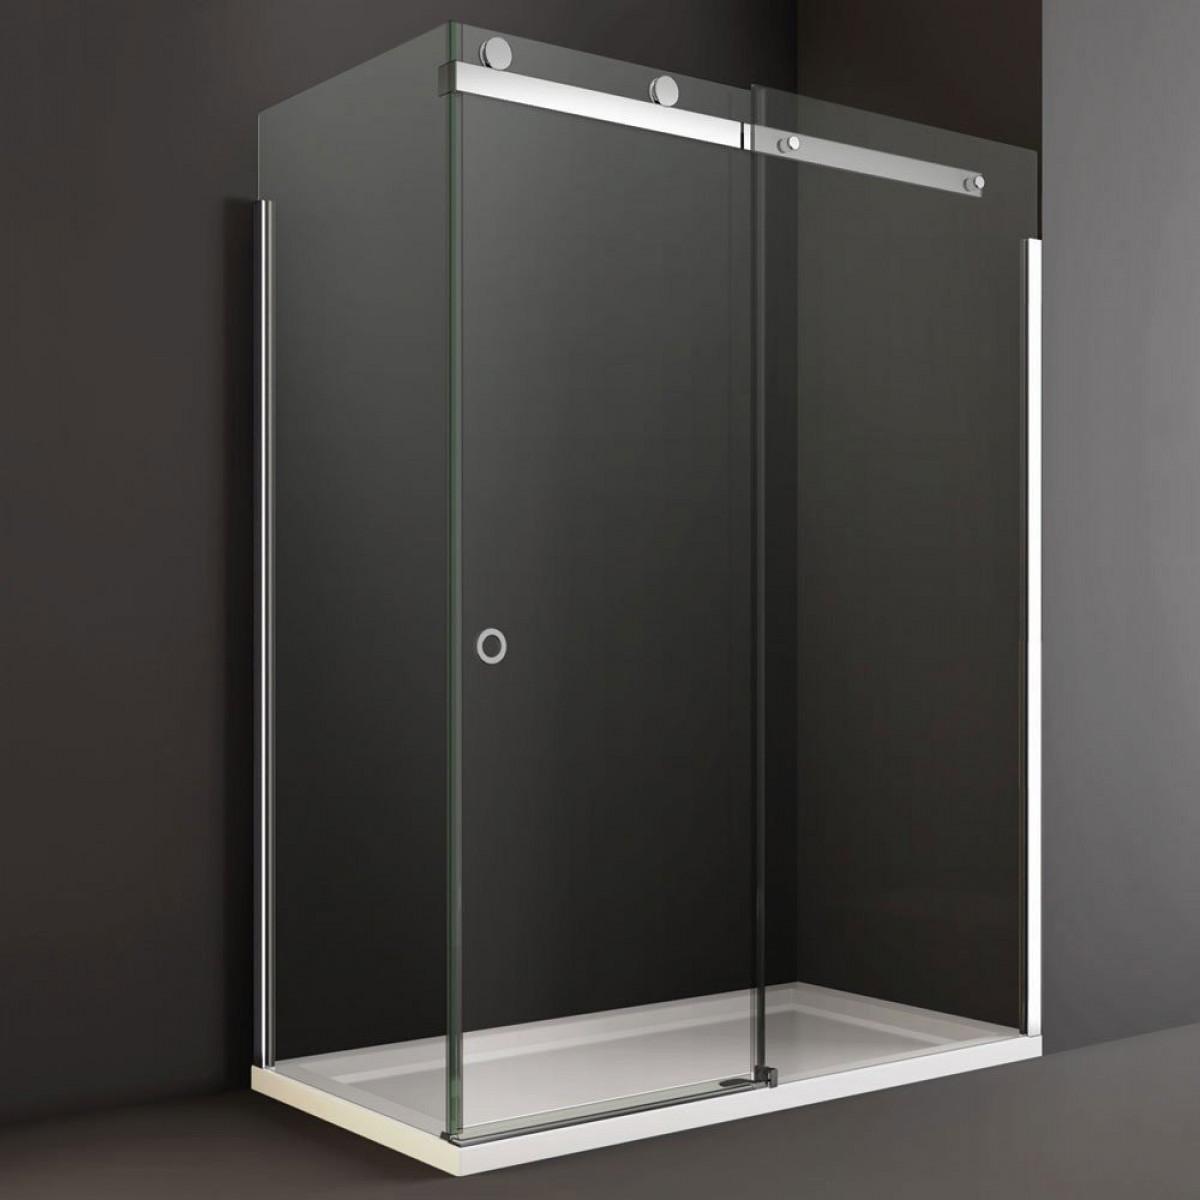 Merlyn 10 Series 1200mm Sliding Shower Door M108241c